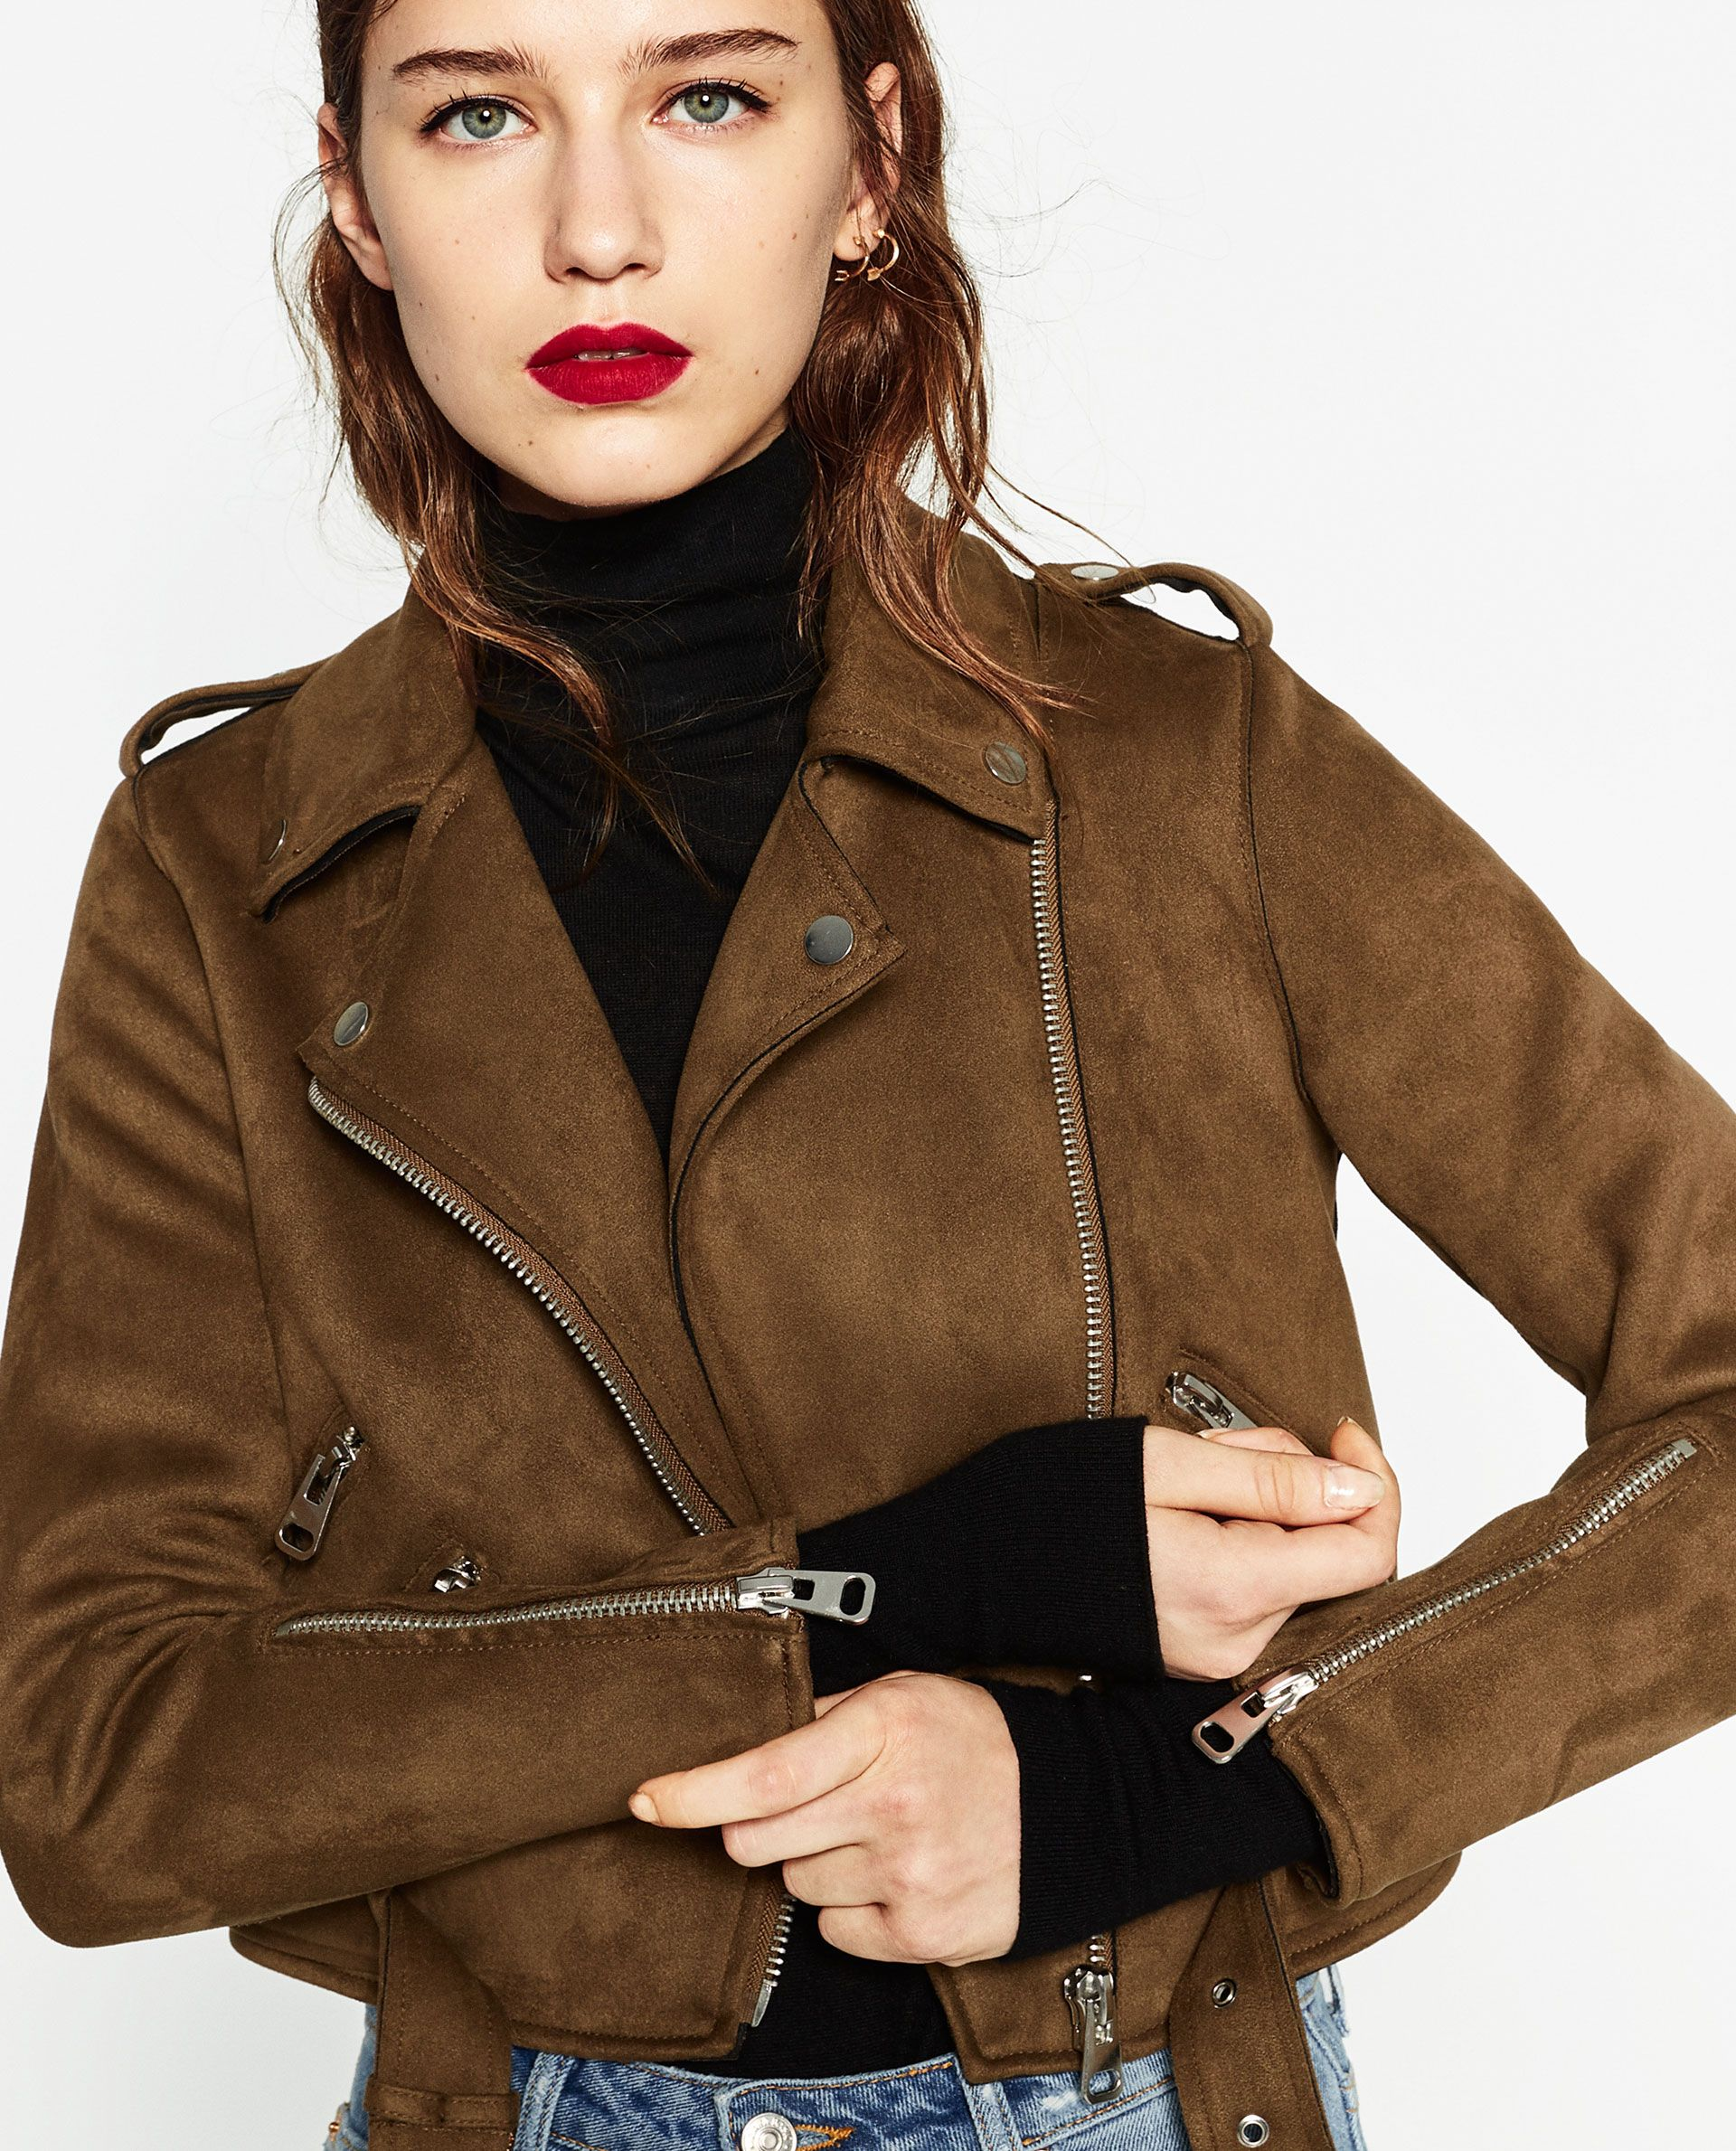 Blusão camurça (caqui) ZARA (49,95€) Fashion, Faux